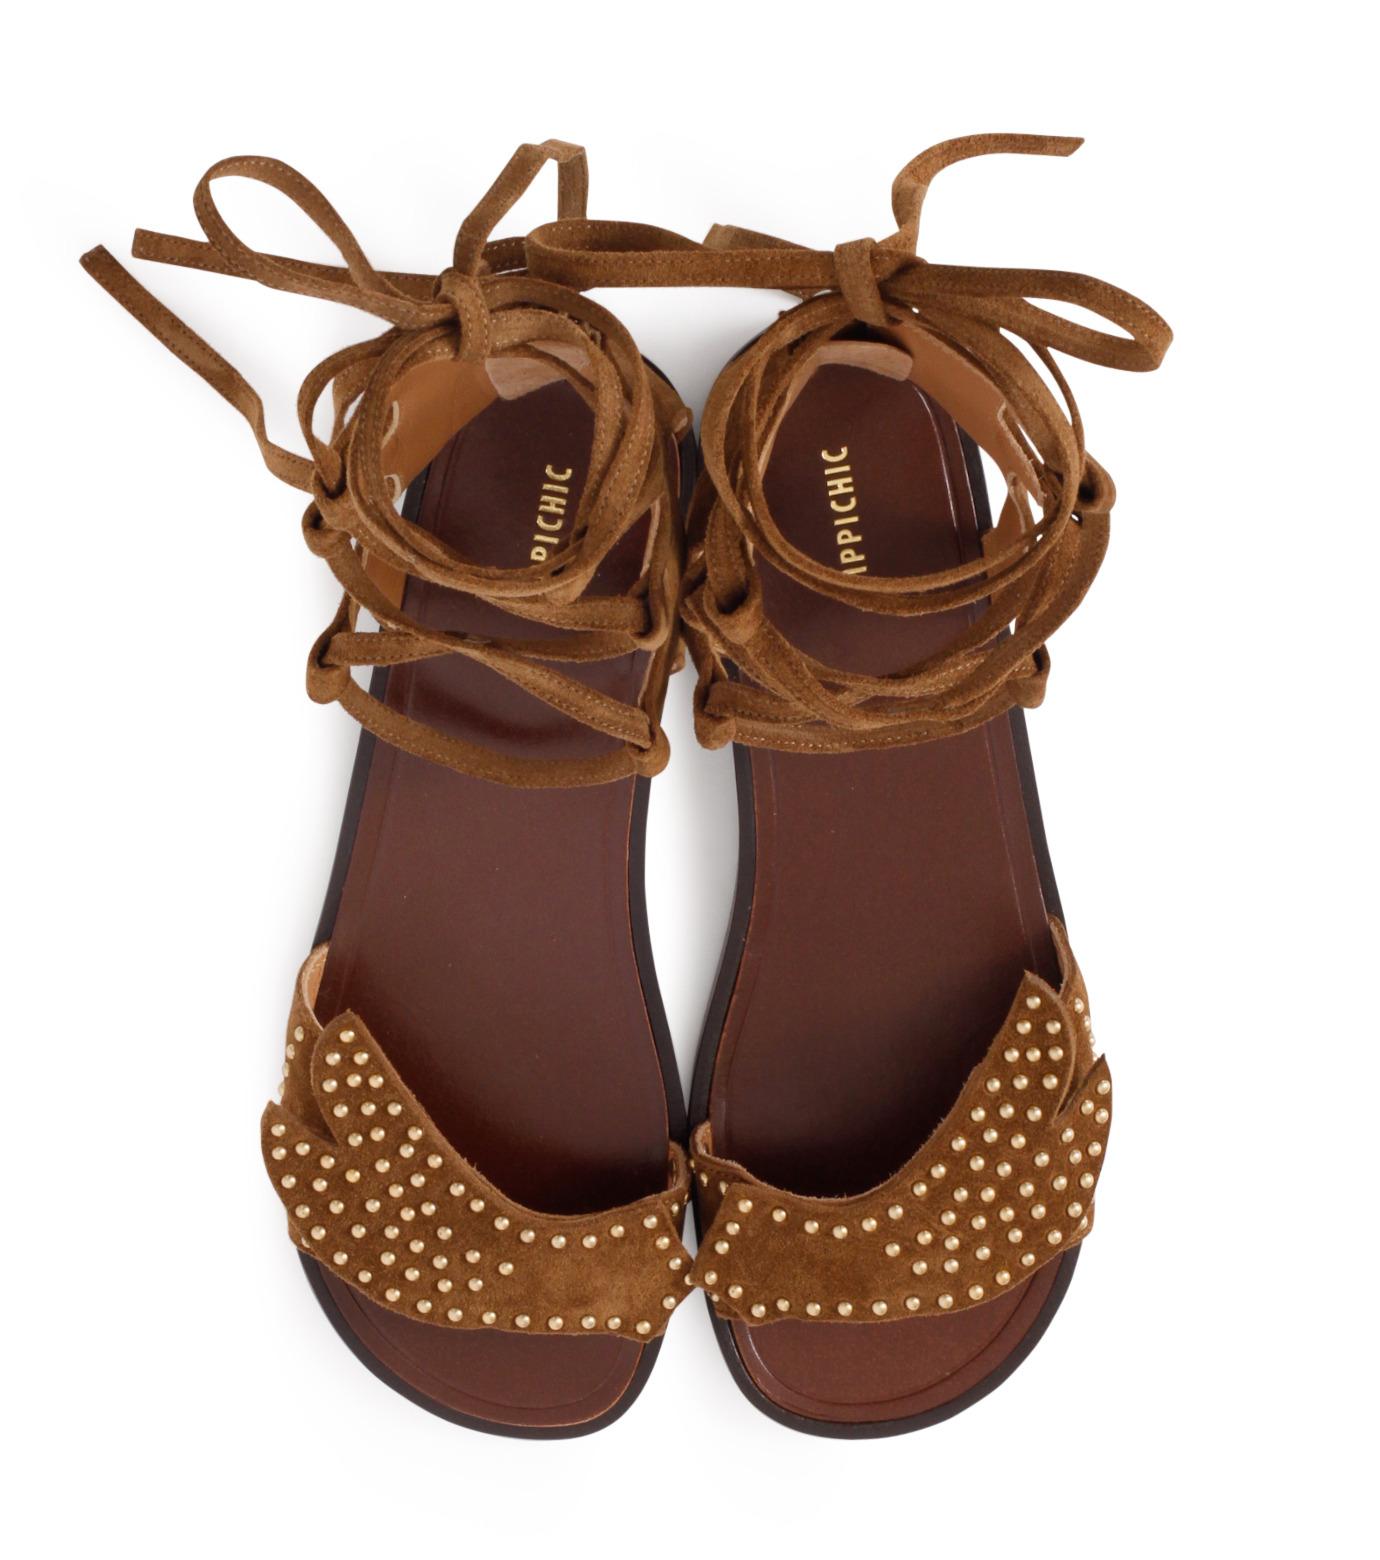 PIPPICHIC(ピッピシック)のbird lace-up flat sandal-BROWN(シューズ/shoes)-PP16S-BIRD24-42 拡大詳細画像4